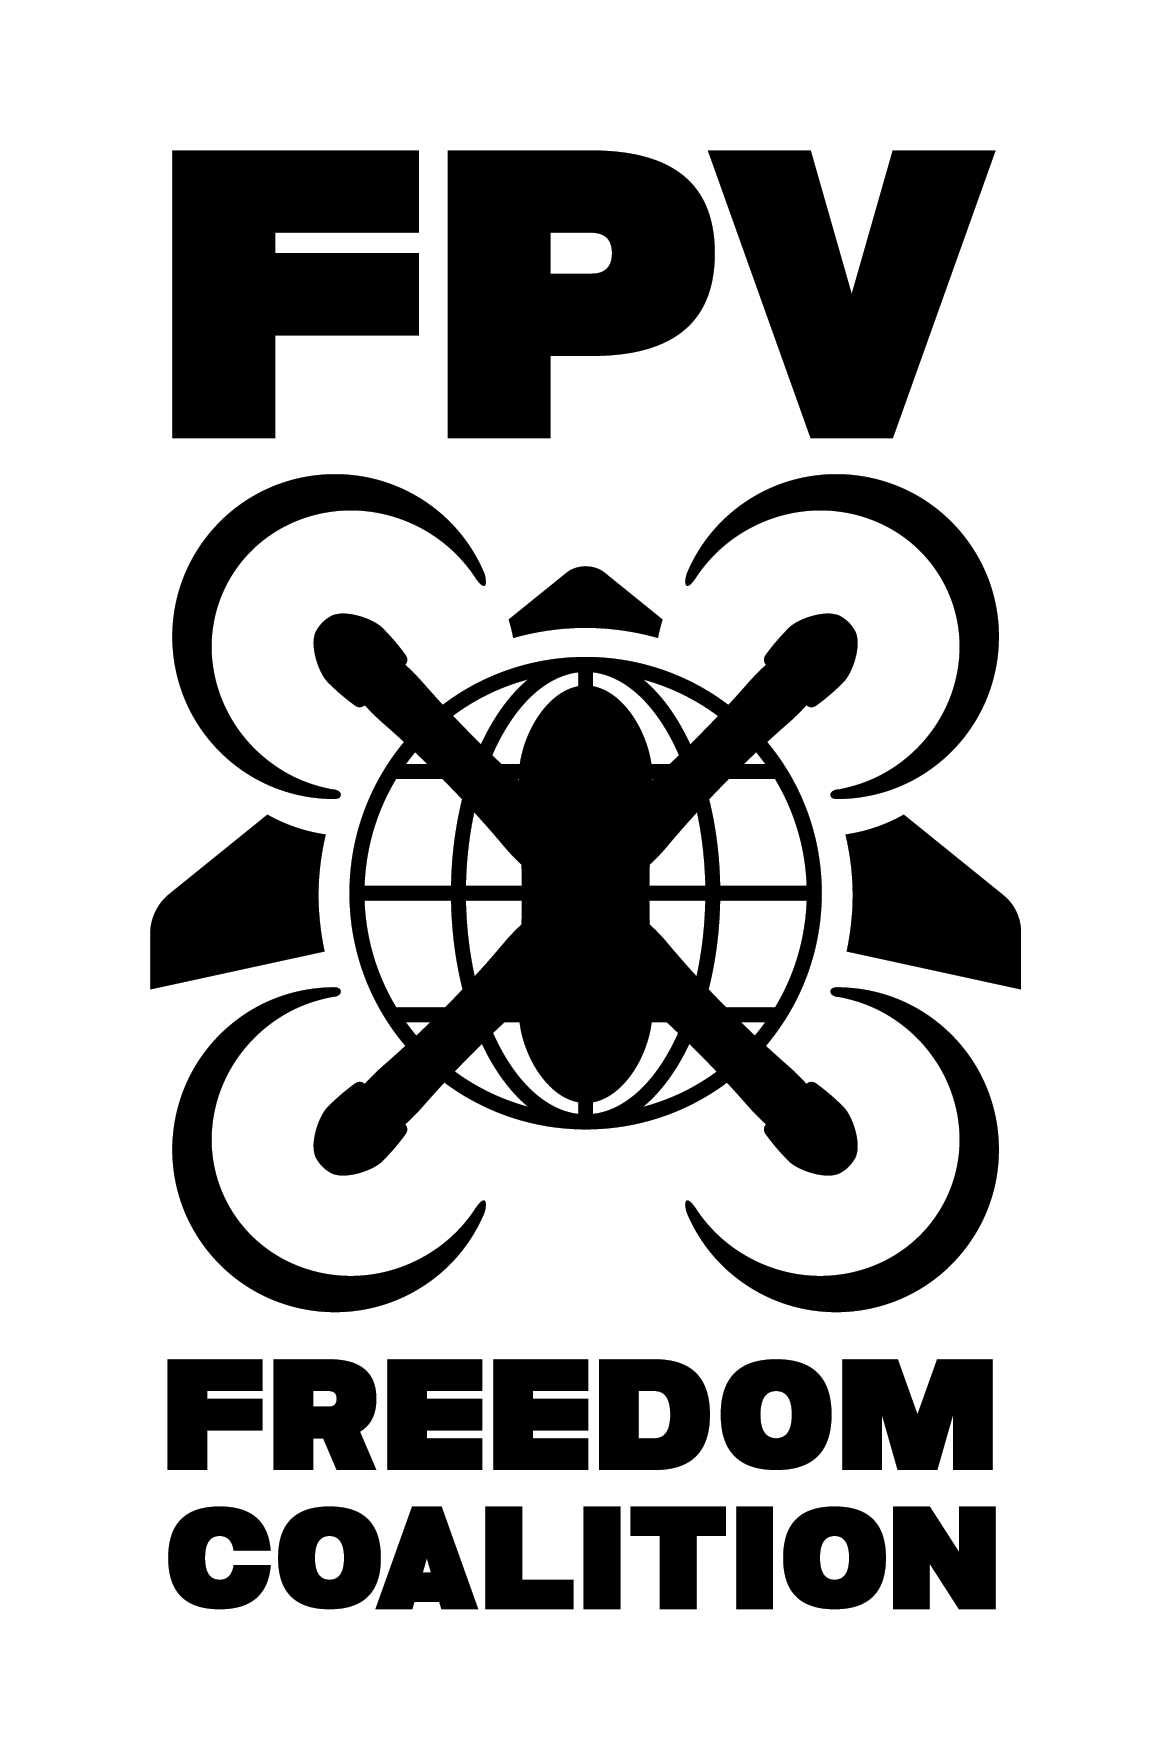 FPVFC---Vertical-Logo-Black-on-White.png